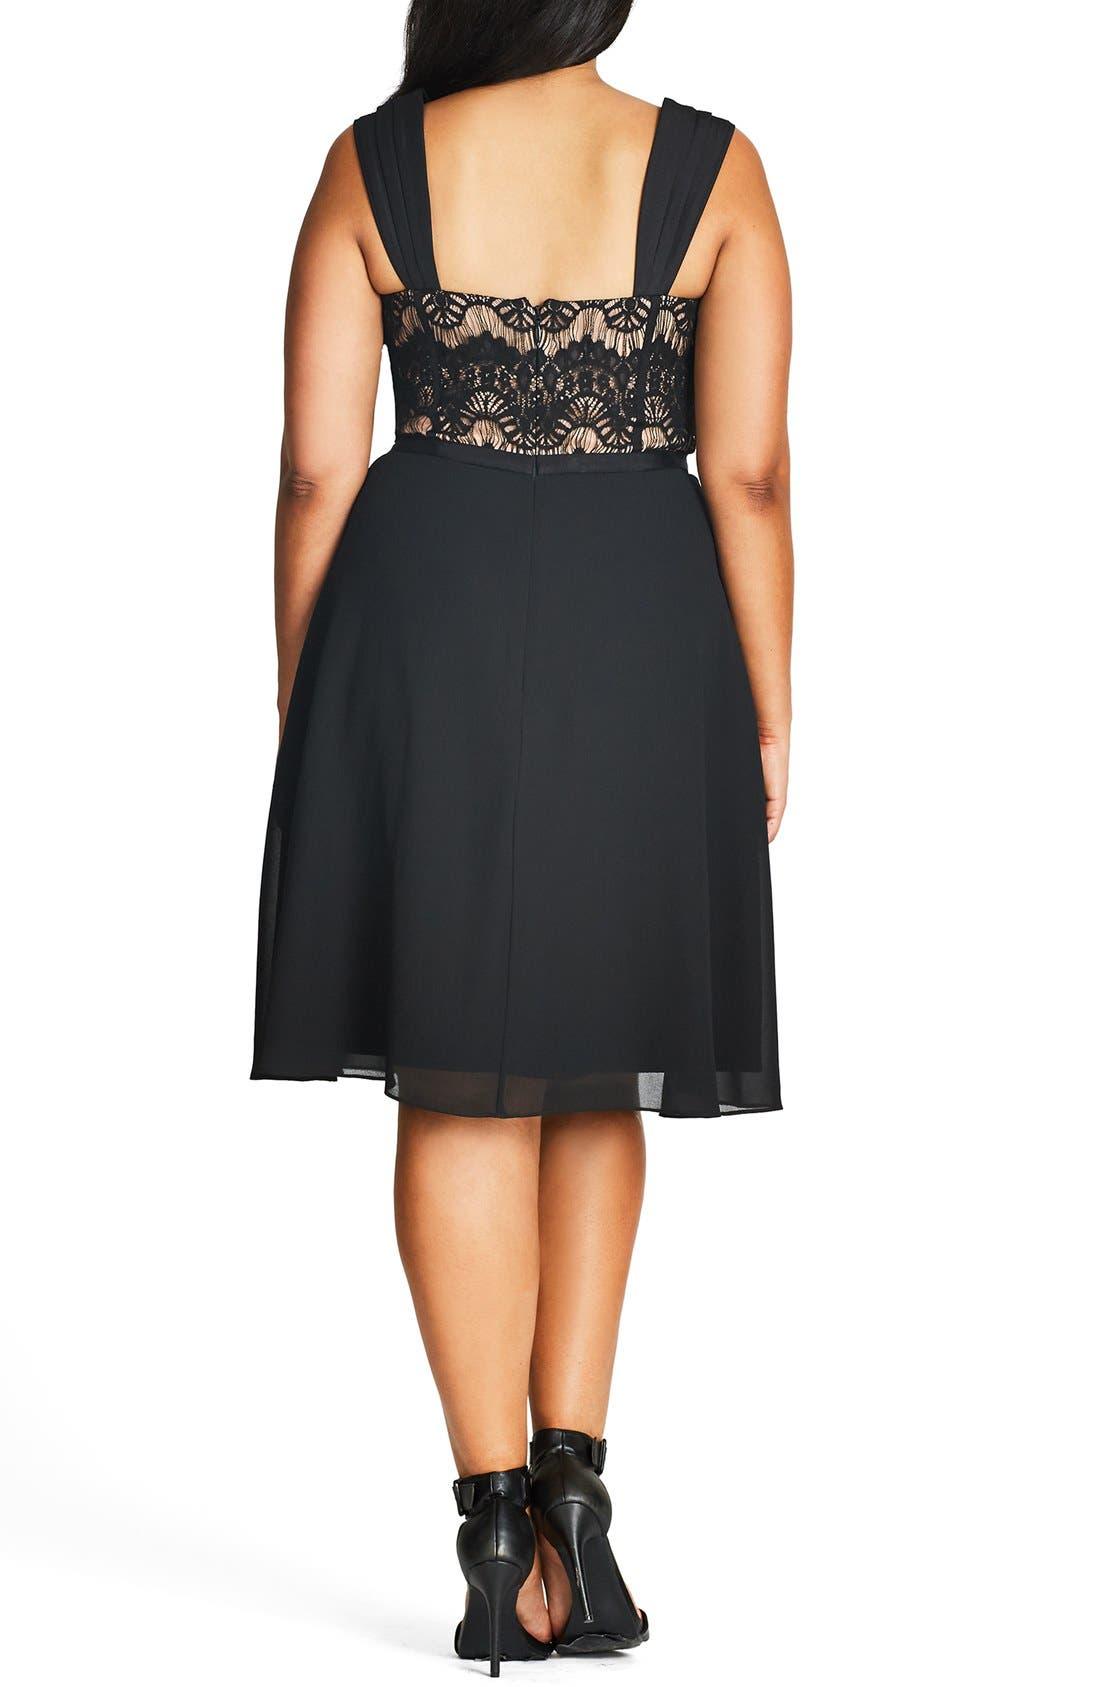 CITY CHIC, 'Eyelash Evie' Lace & Chiffon Cocktail Dress, Alternate thumbnail 3, color, BLACK